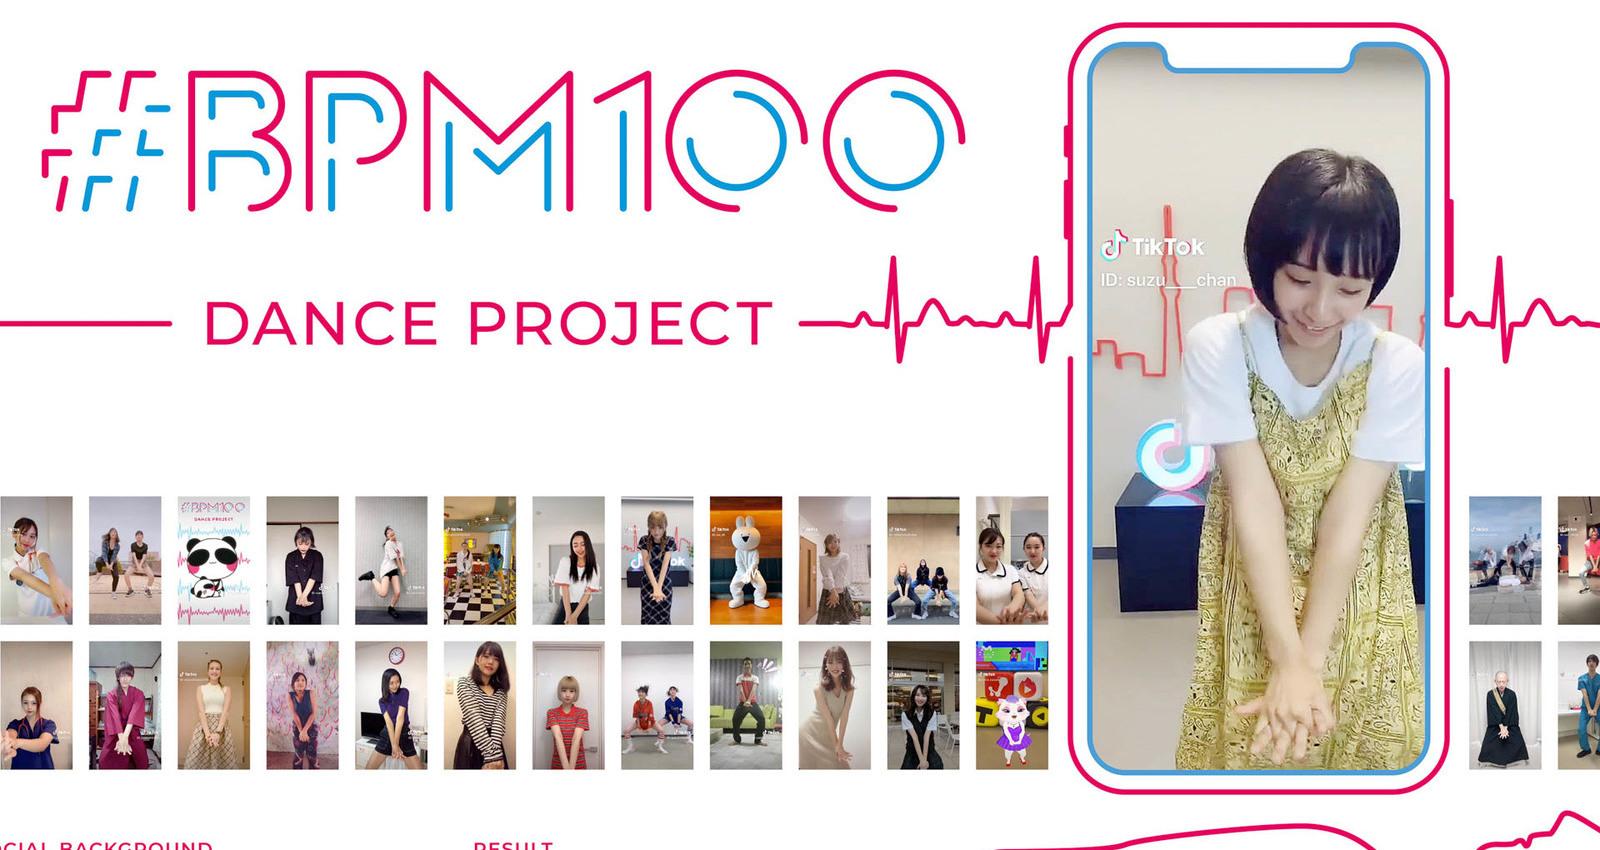 #BPM100 DANCE PROJECT